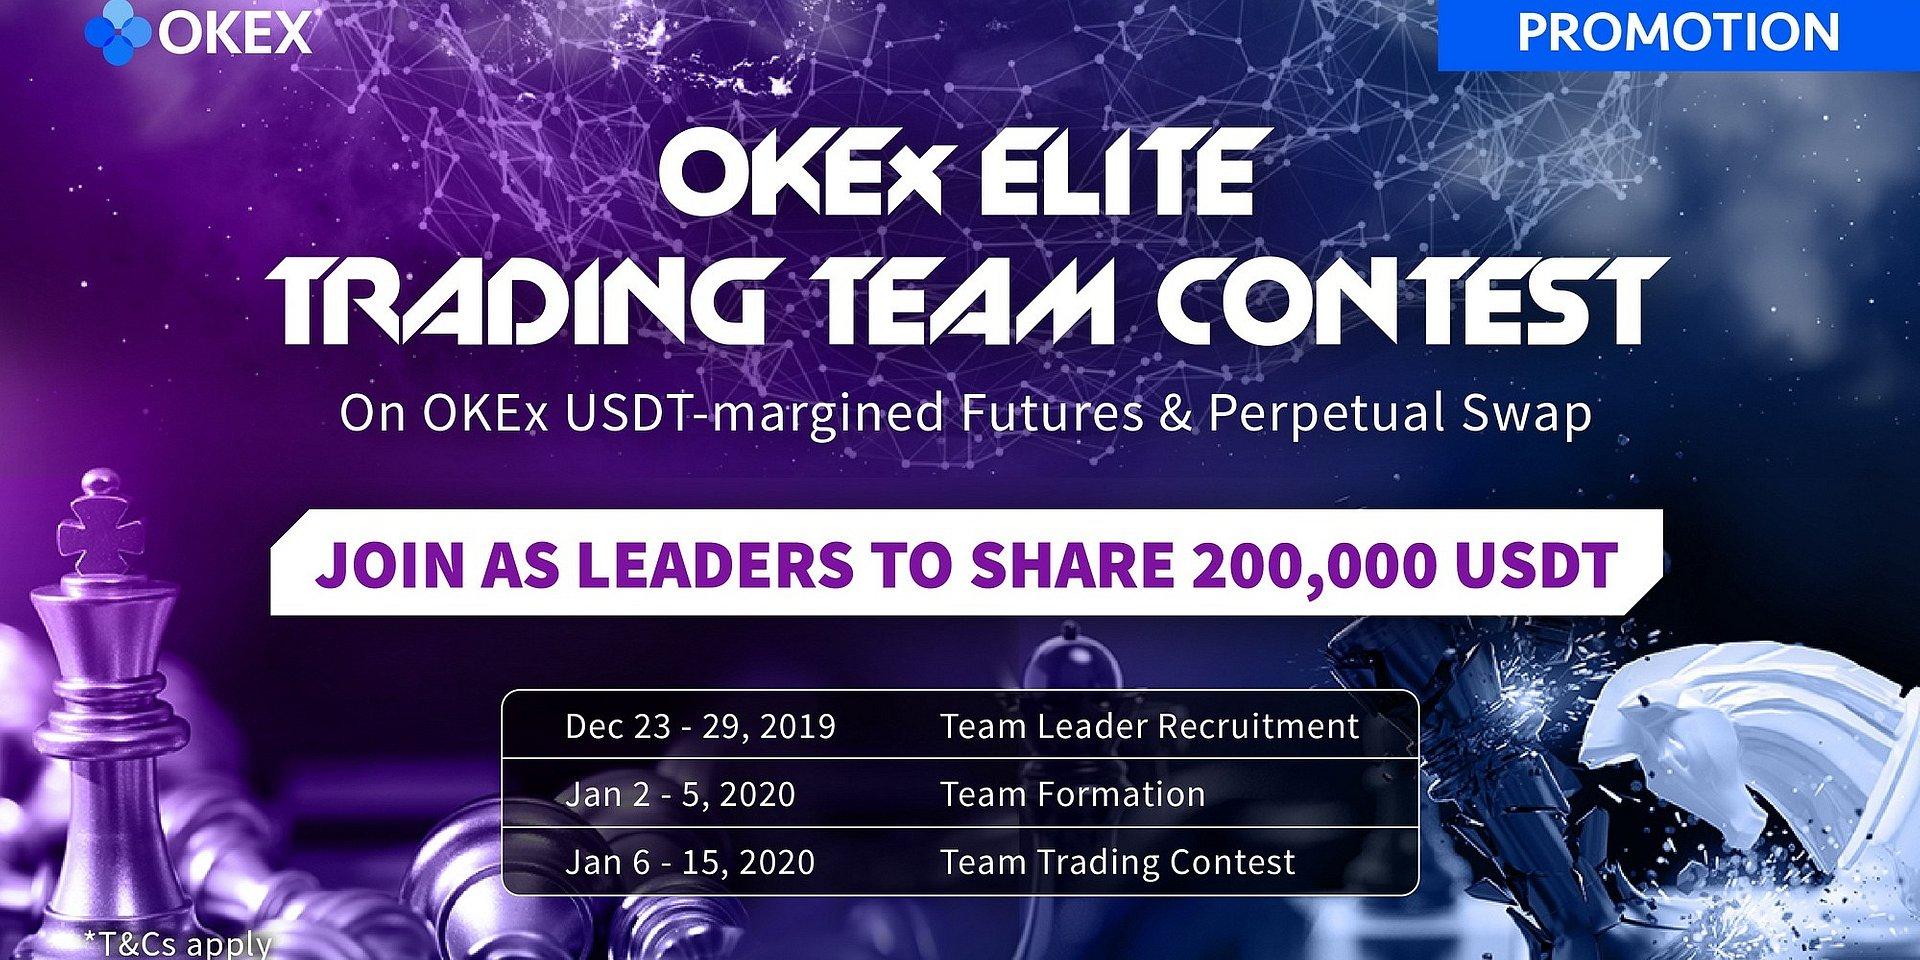 Global Elite Trading Team Contest